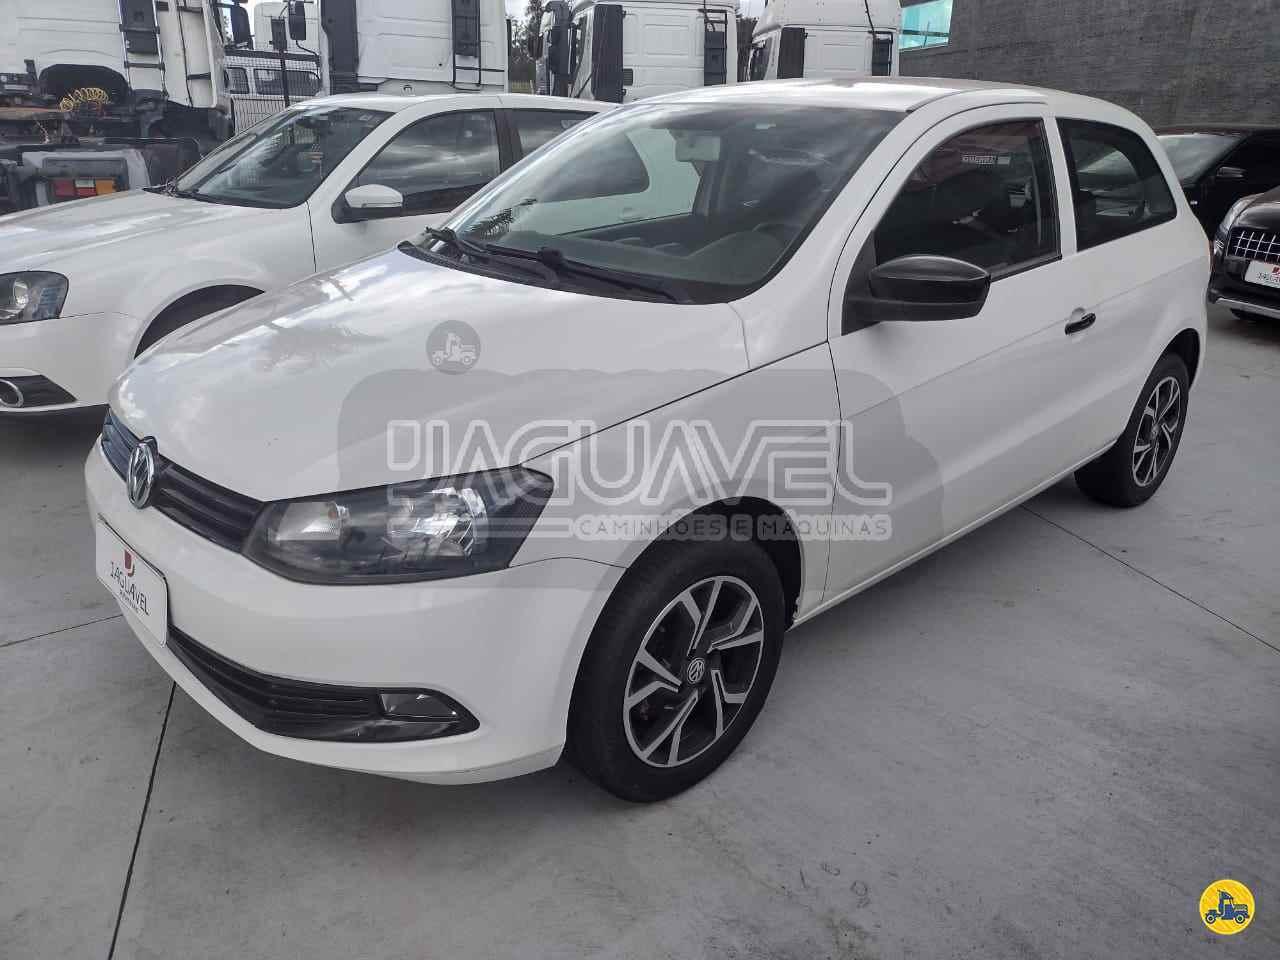 CARRO VW - Volkswagen Gol 1.0 Special Jaguavel Caminhões JAGUARIAIVA PARANÁ PR